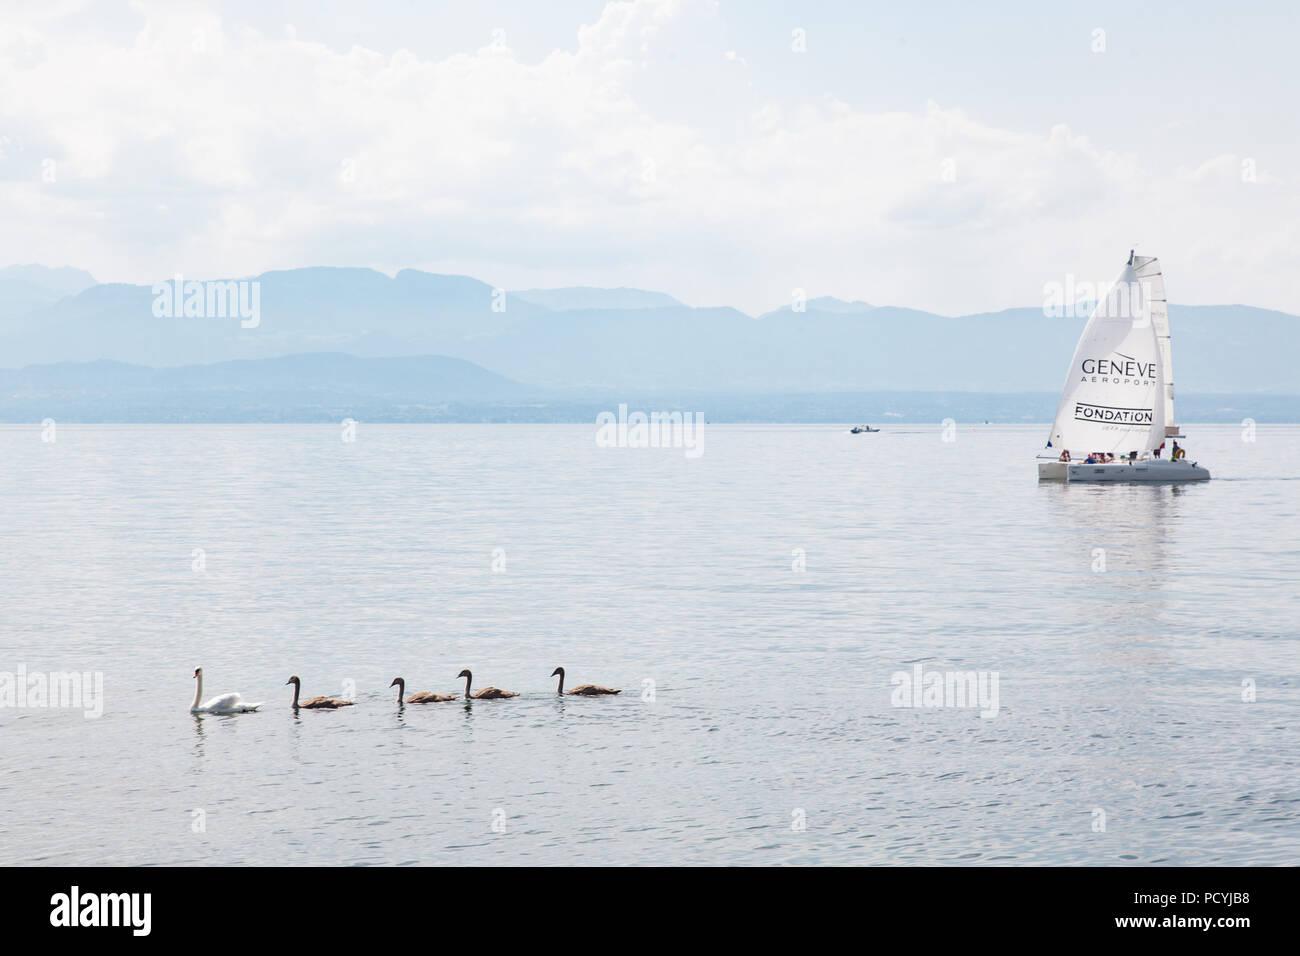 Wonderful sight of swans family with mother and four babies and yacht sailing on Geneva Lake (Lake Leman) near Rolle, La Cote region, Switzerland - Stock Image